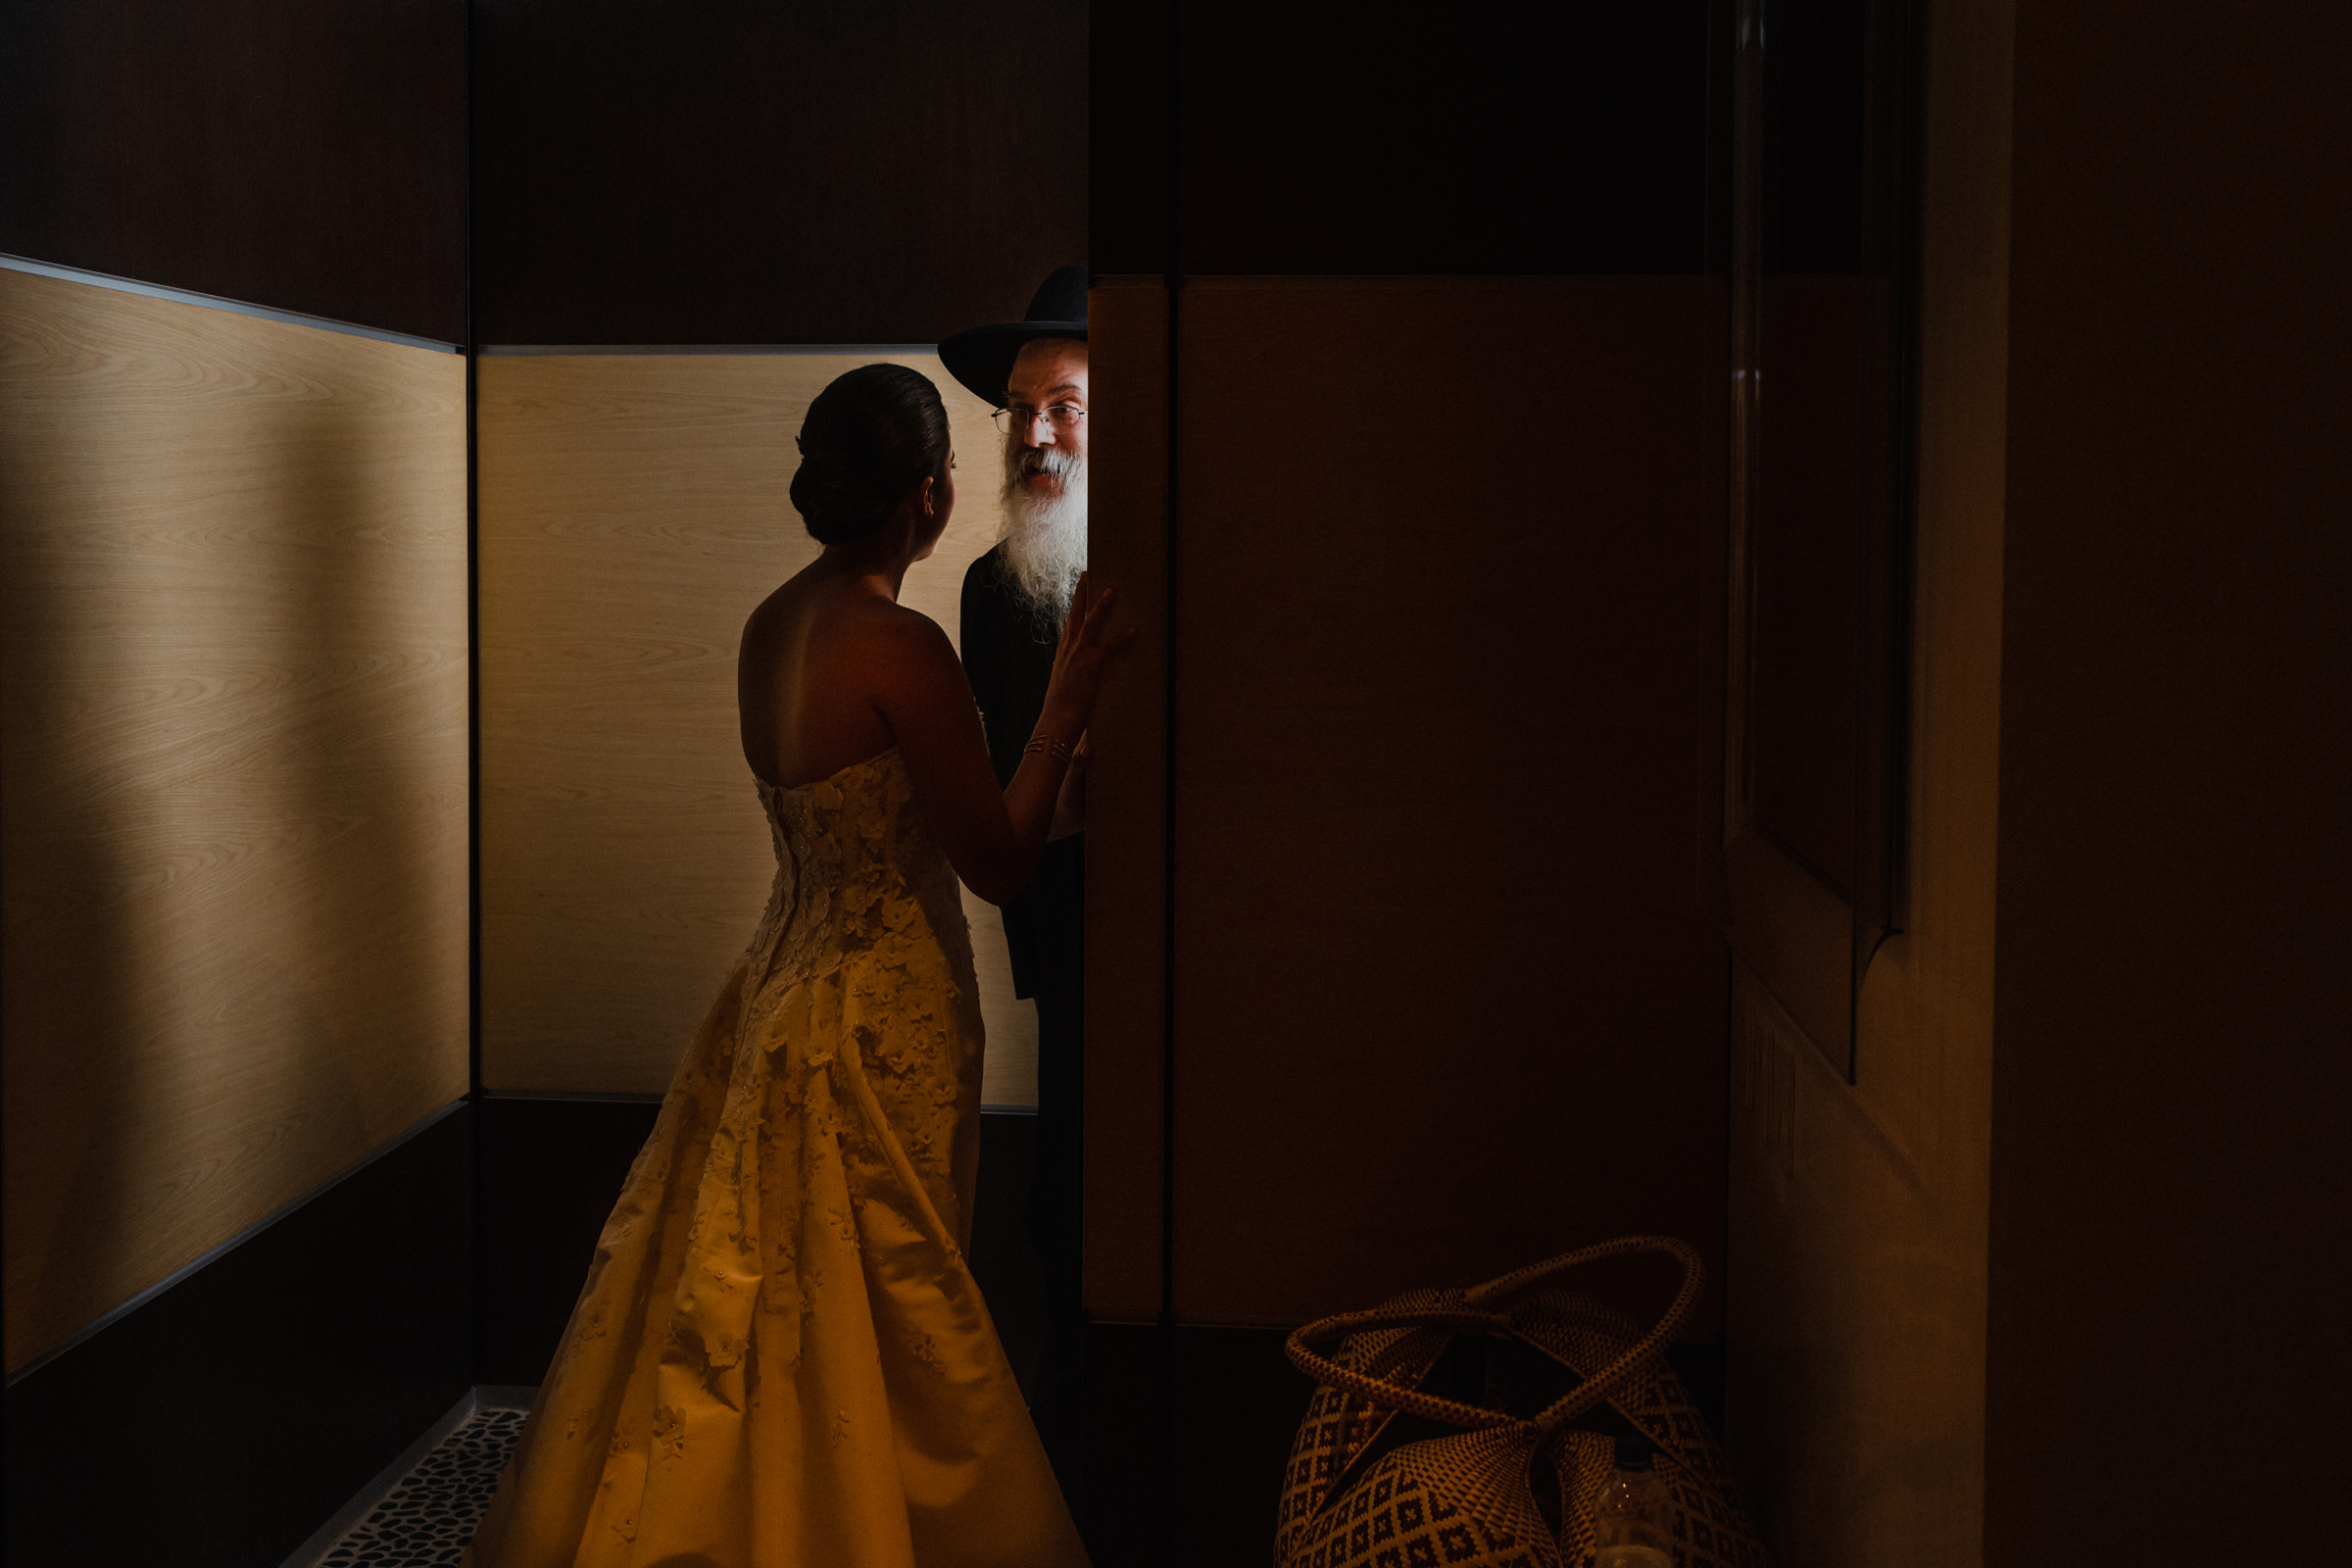 Rabbi has a quick word with bride before ceremony - photo by El Marco Rojo